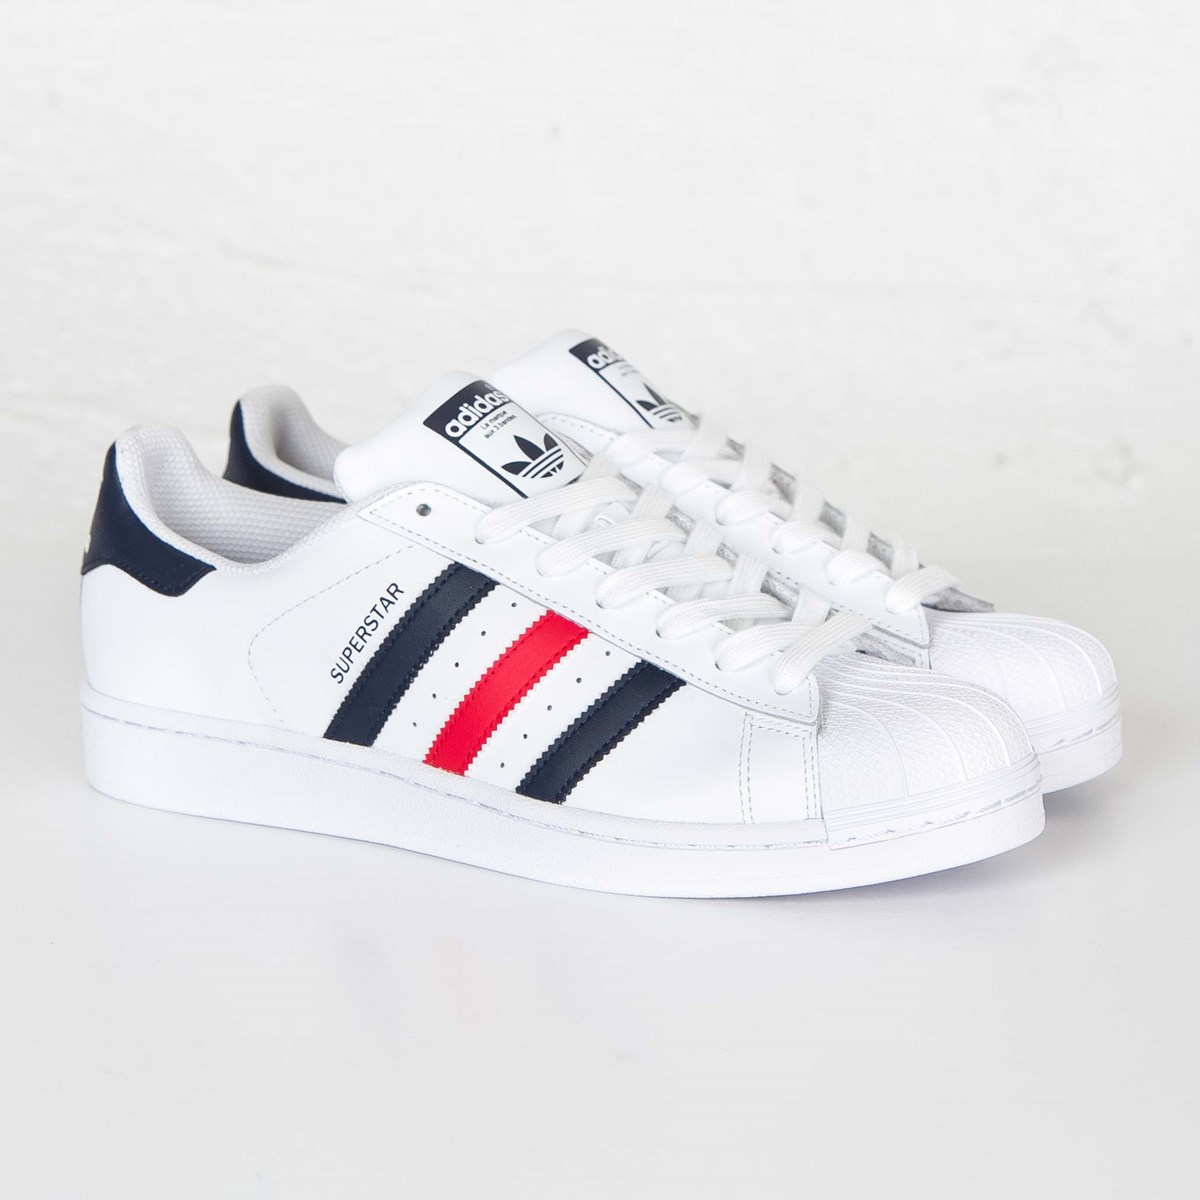 adidas Superstar Foundation - S79208 - Sneakersnstuff | sneakers